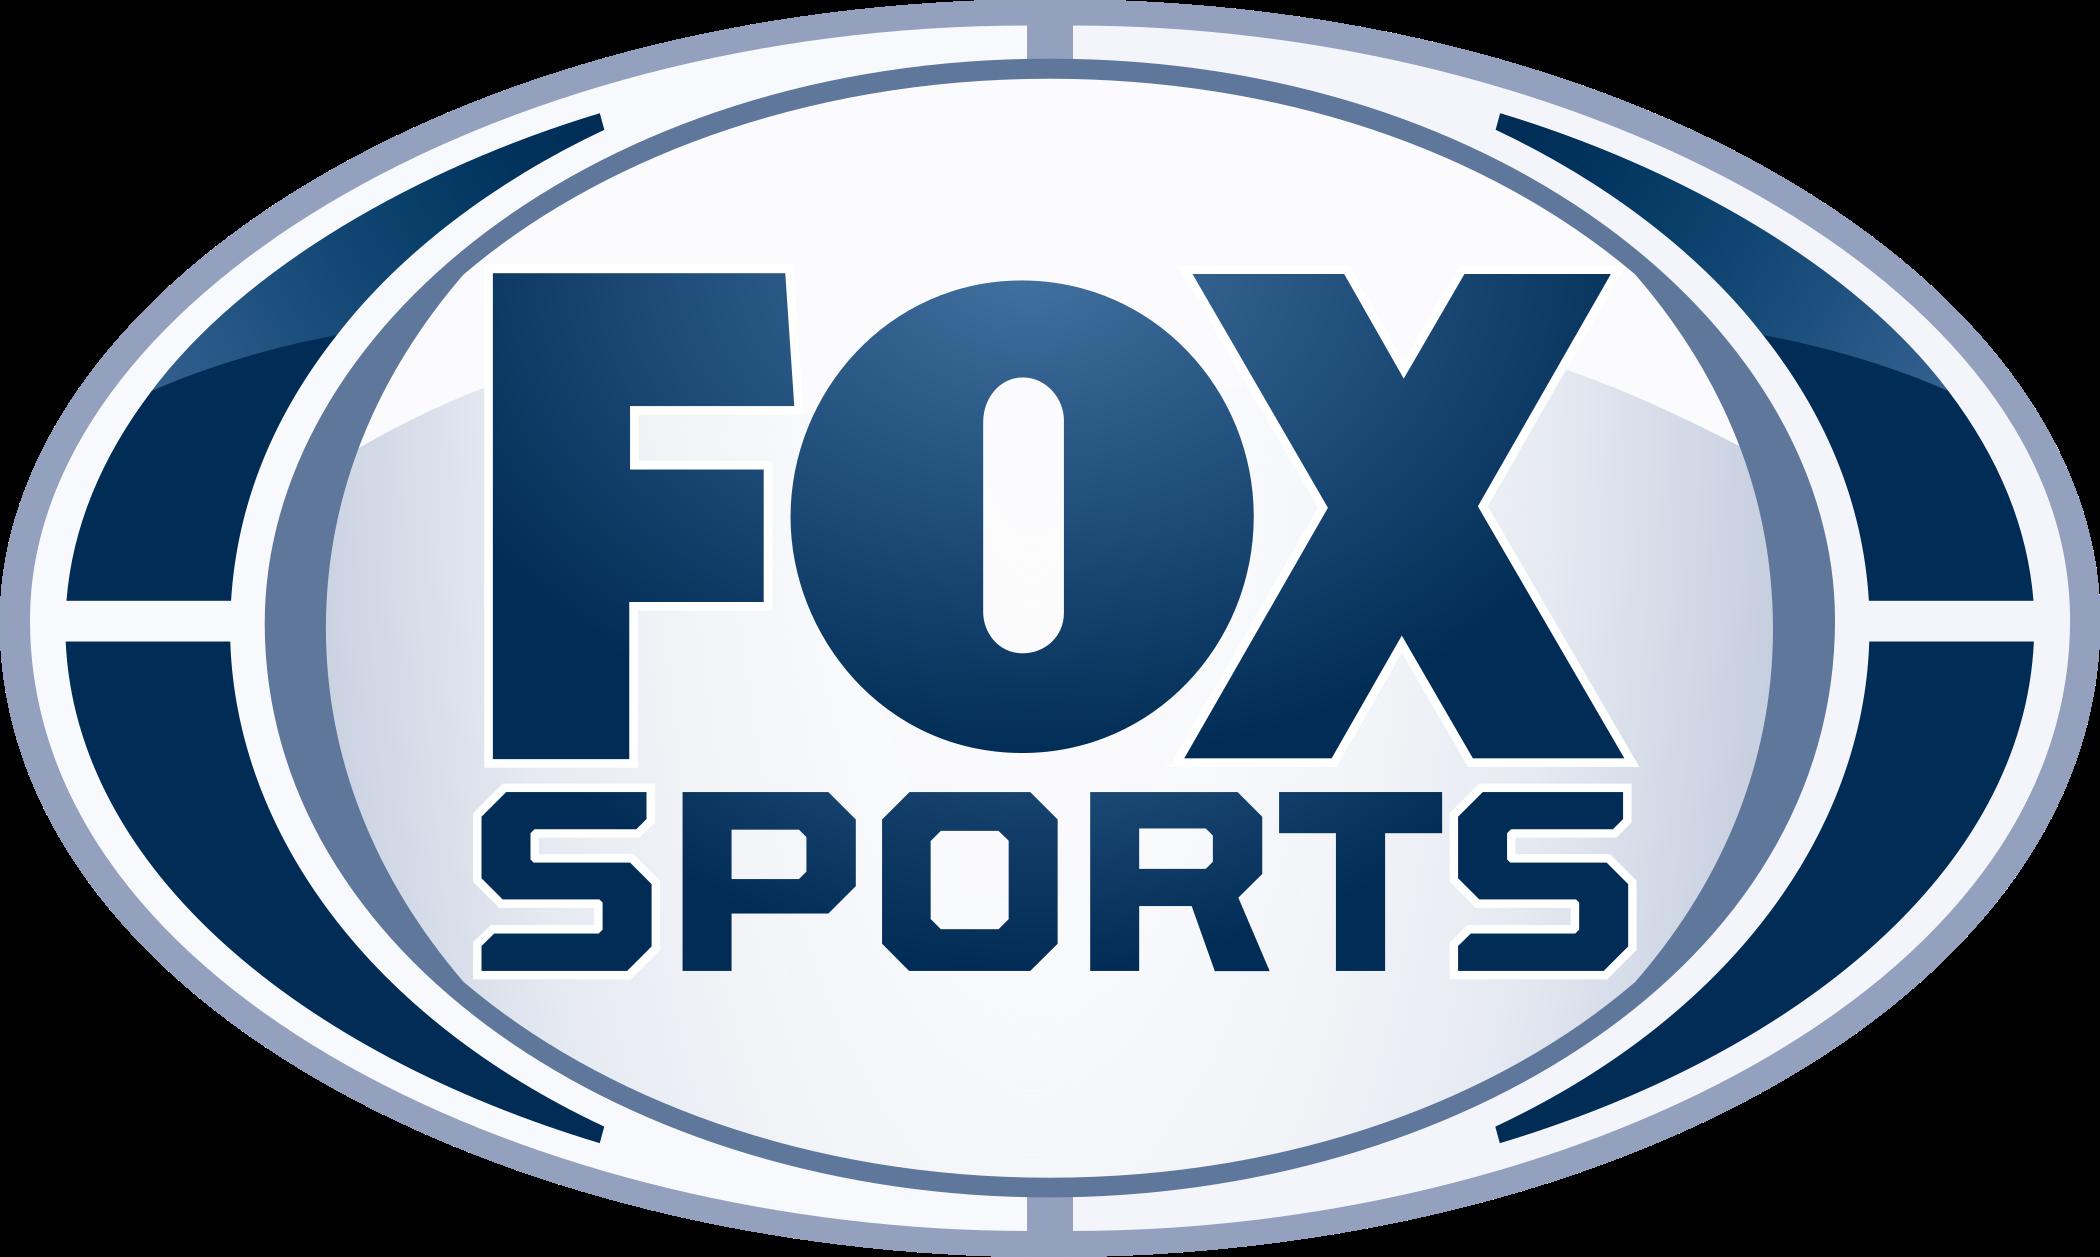 fox-sports-logo-1